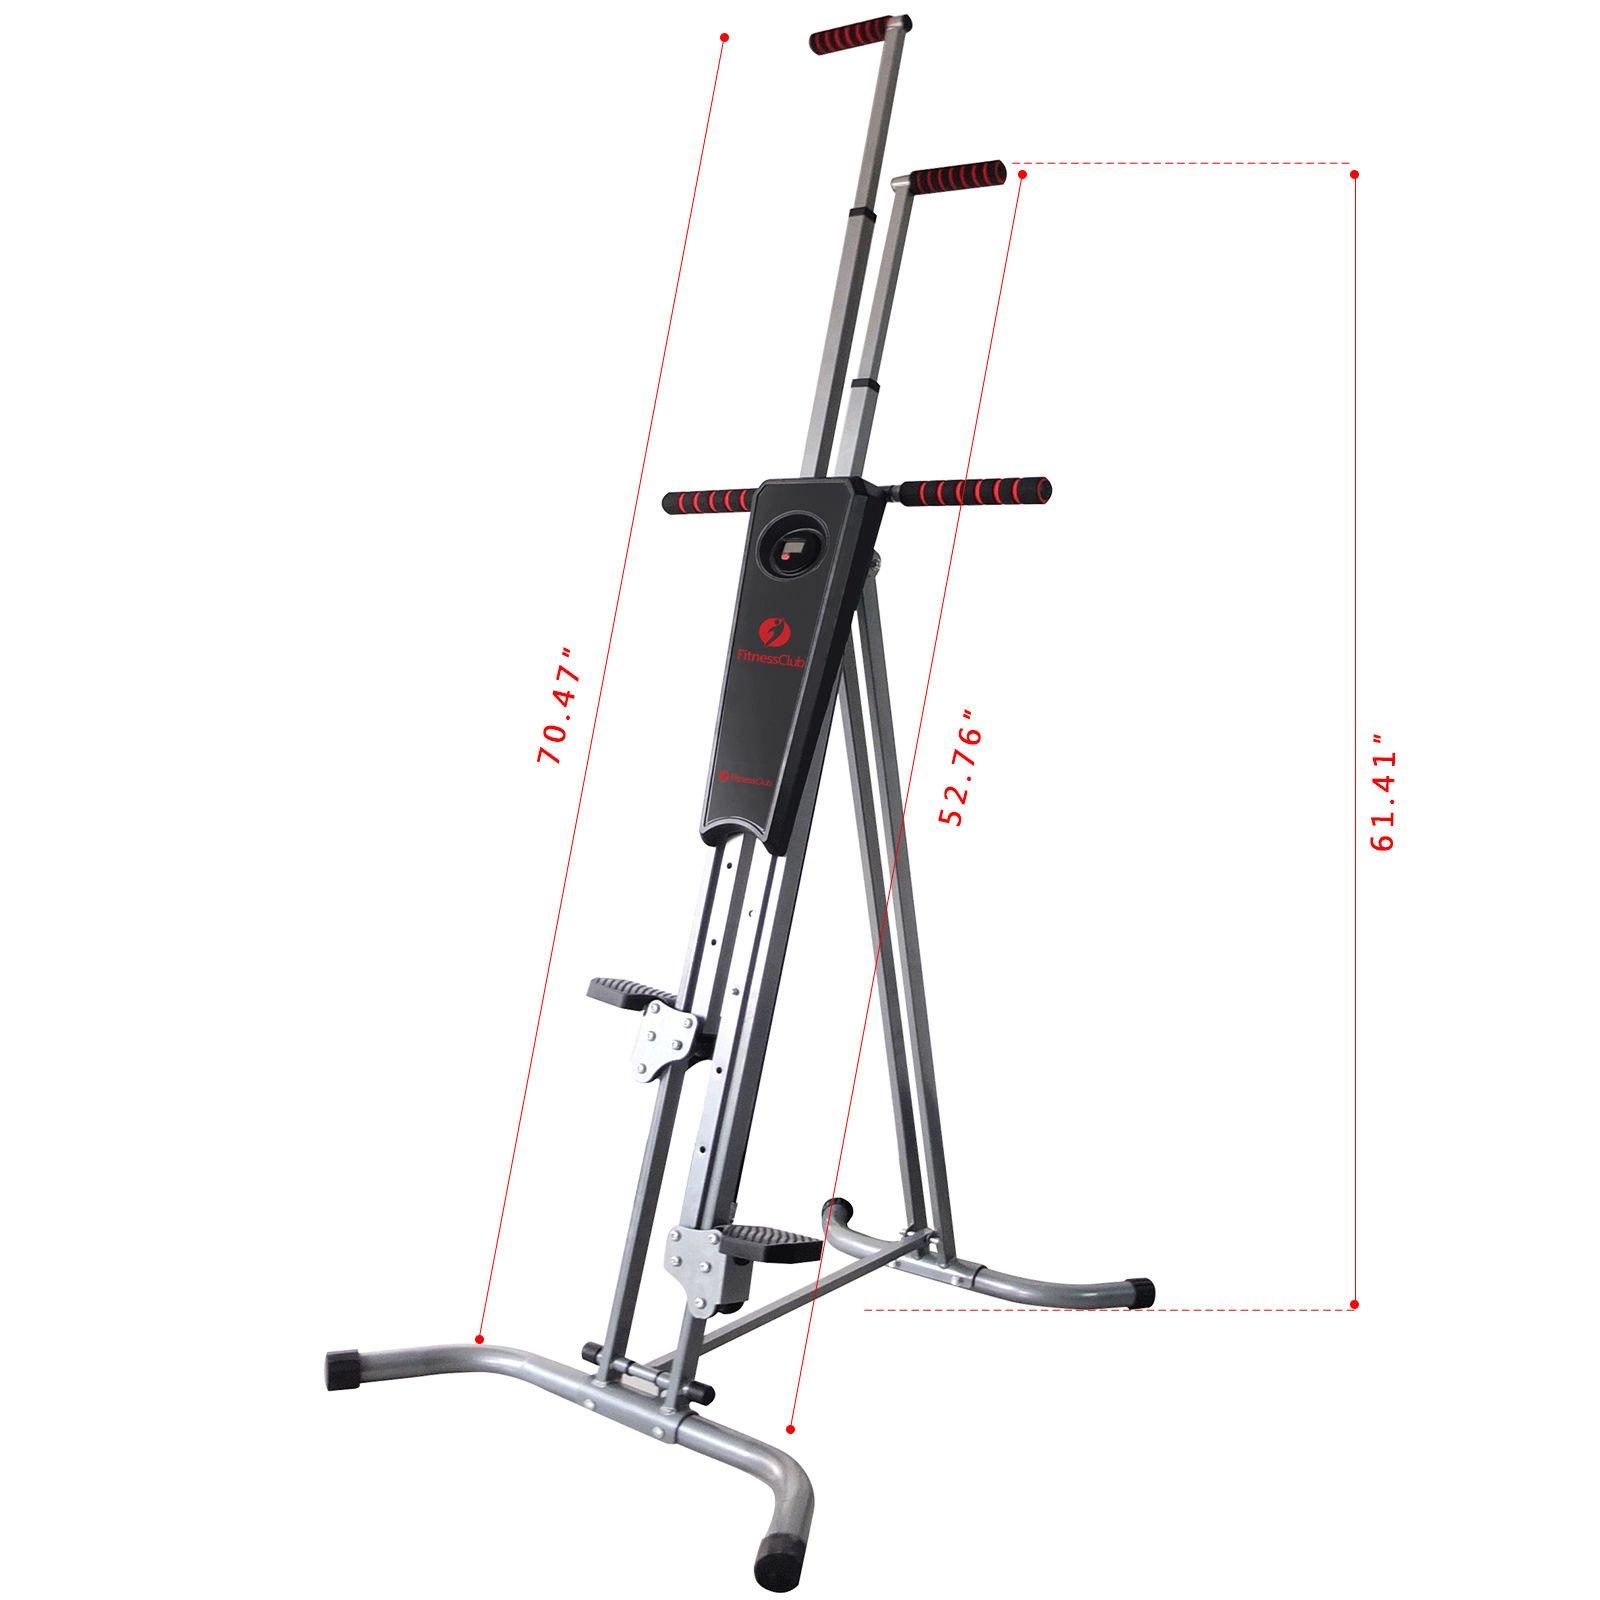 Home Exercise Equipment Stepper: Fitnessclub Vertical Climber Exercise Climbing Machine